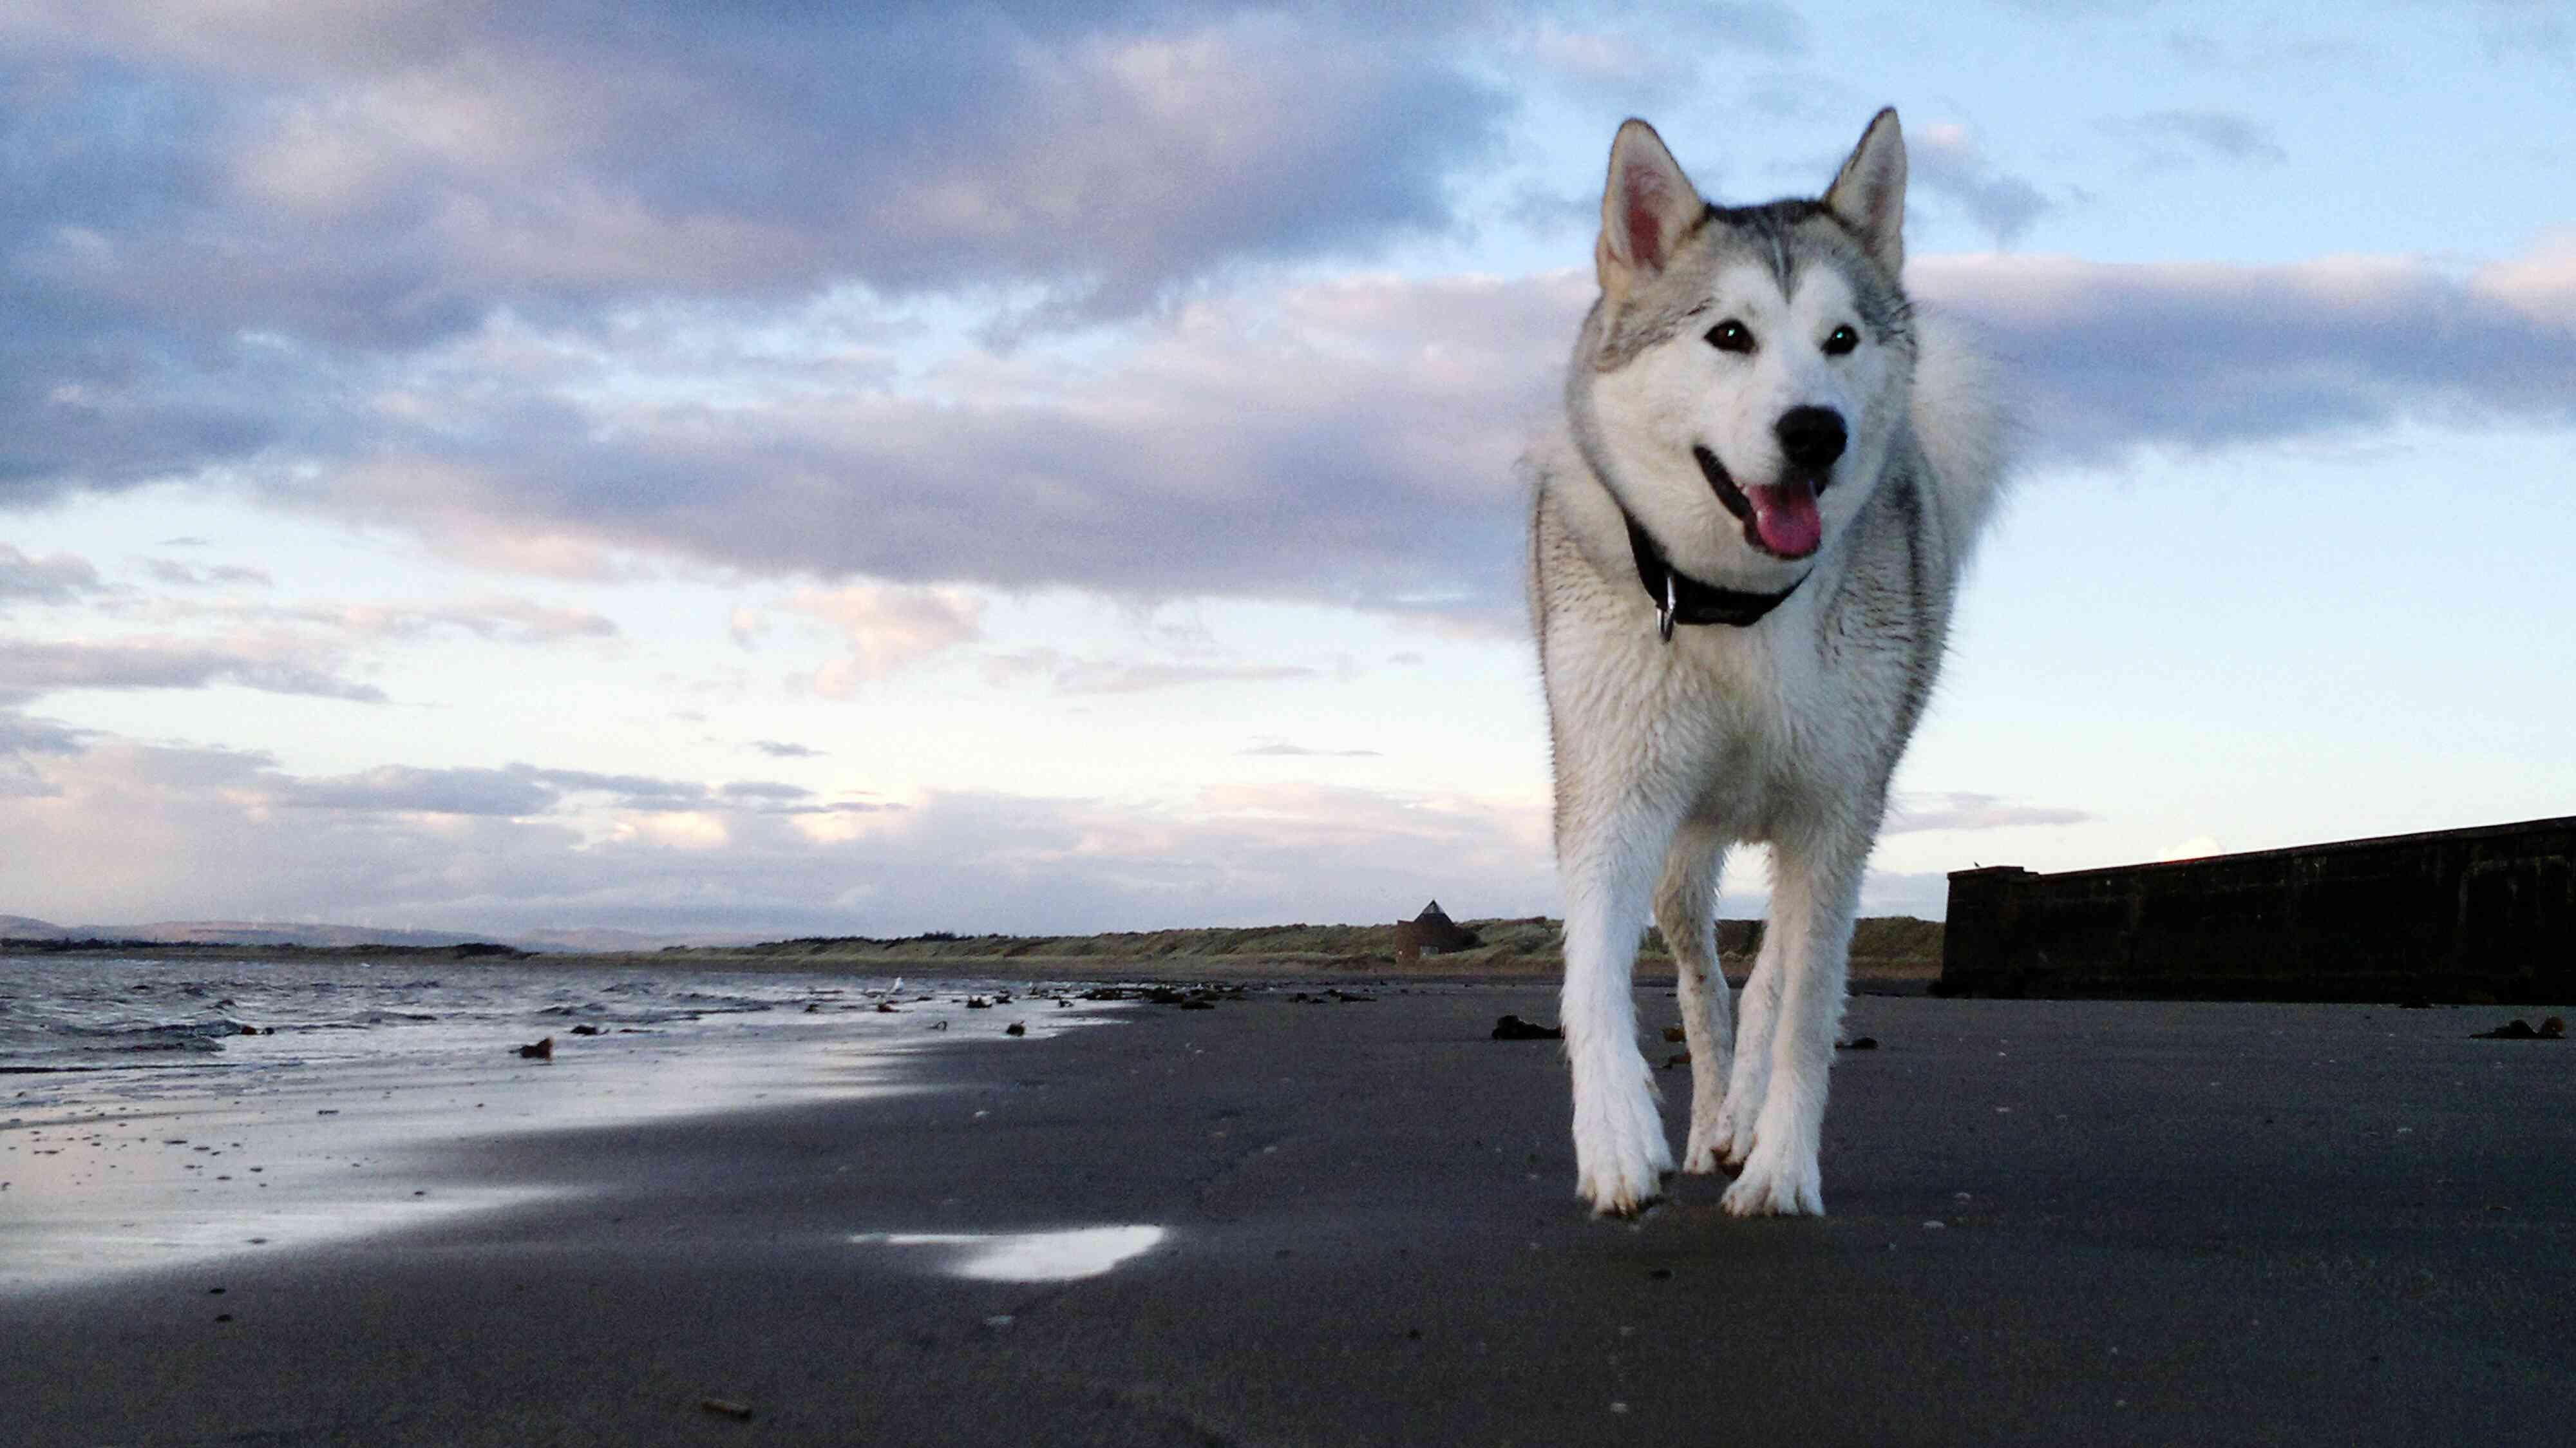 A Siberian husky running on a beach